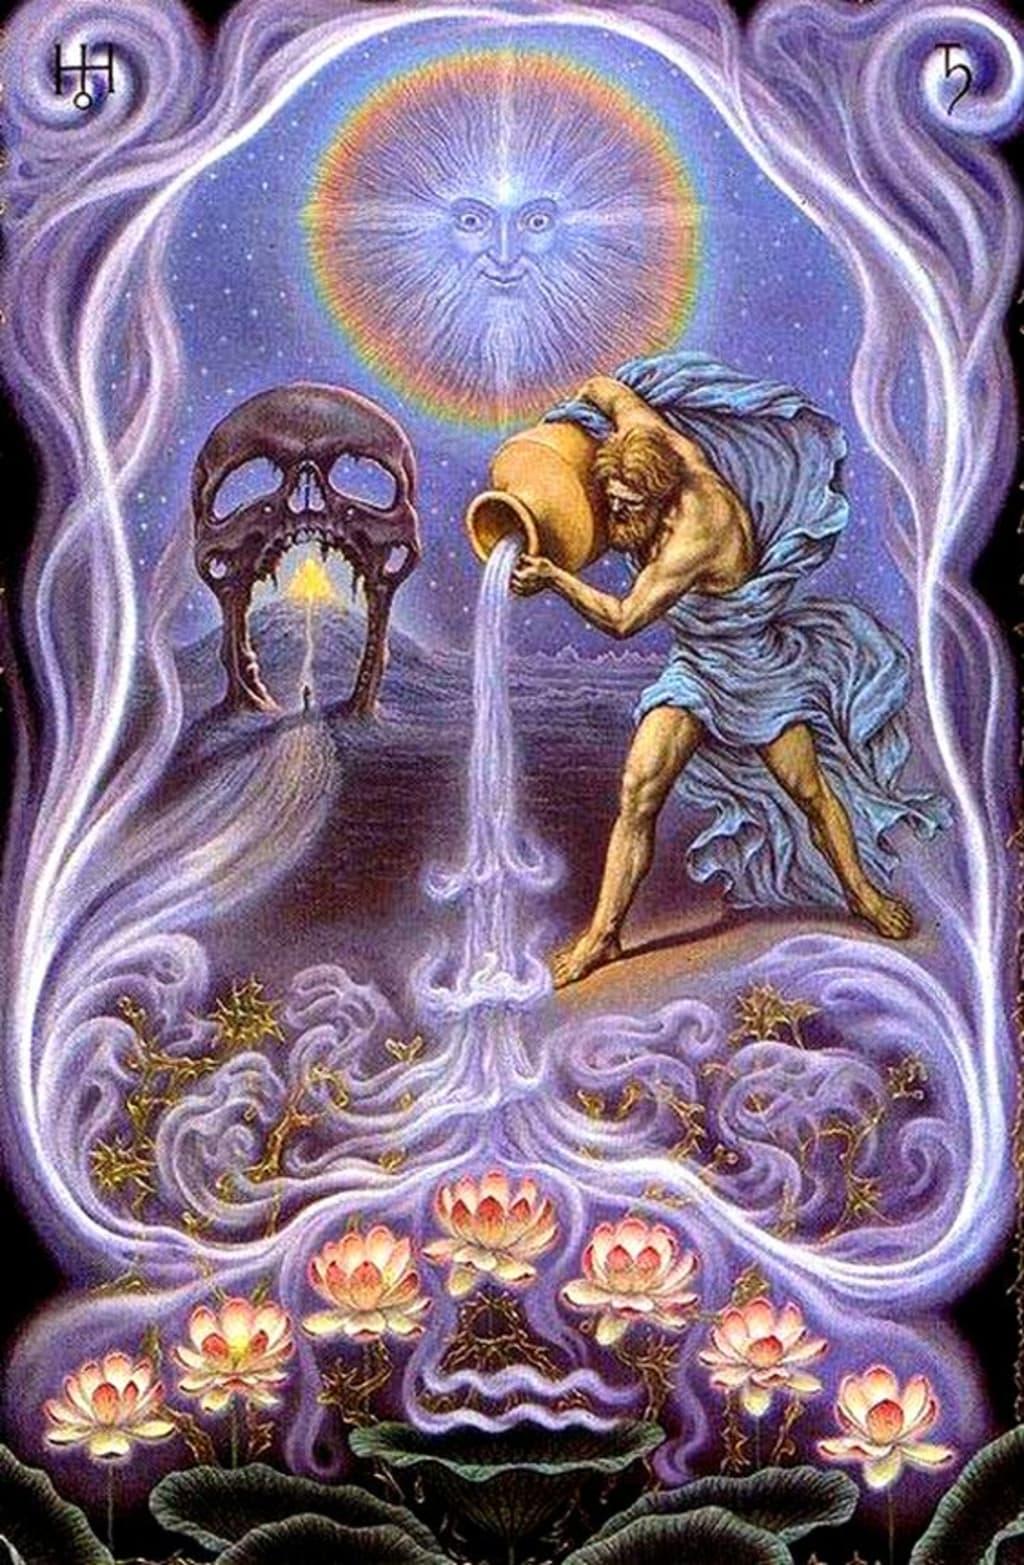 Good Vibrations: February 2019's New Moon in Aquarius